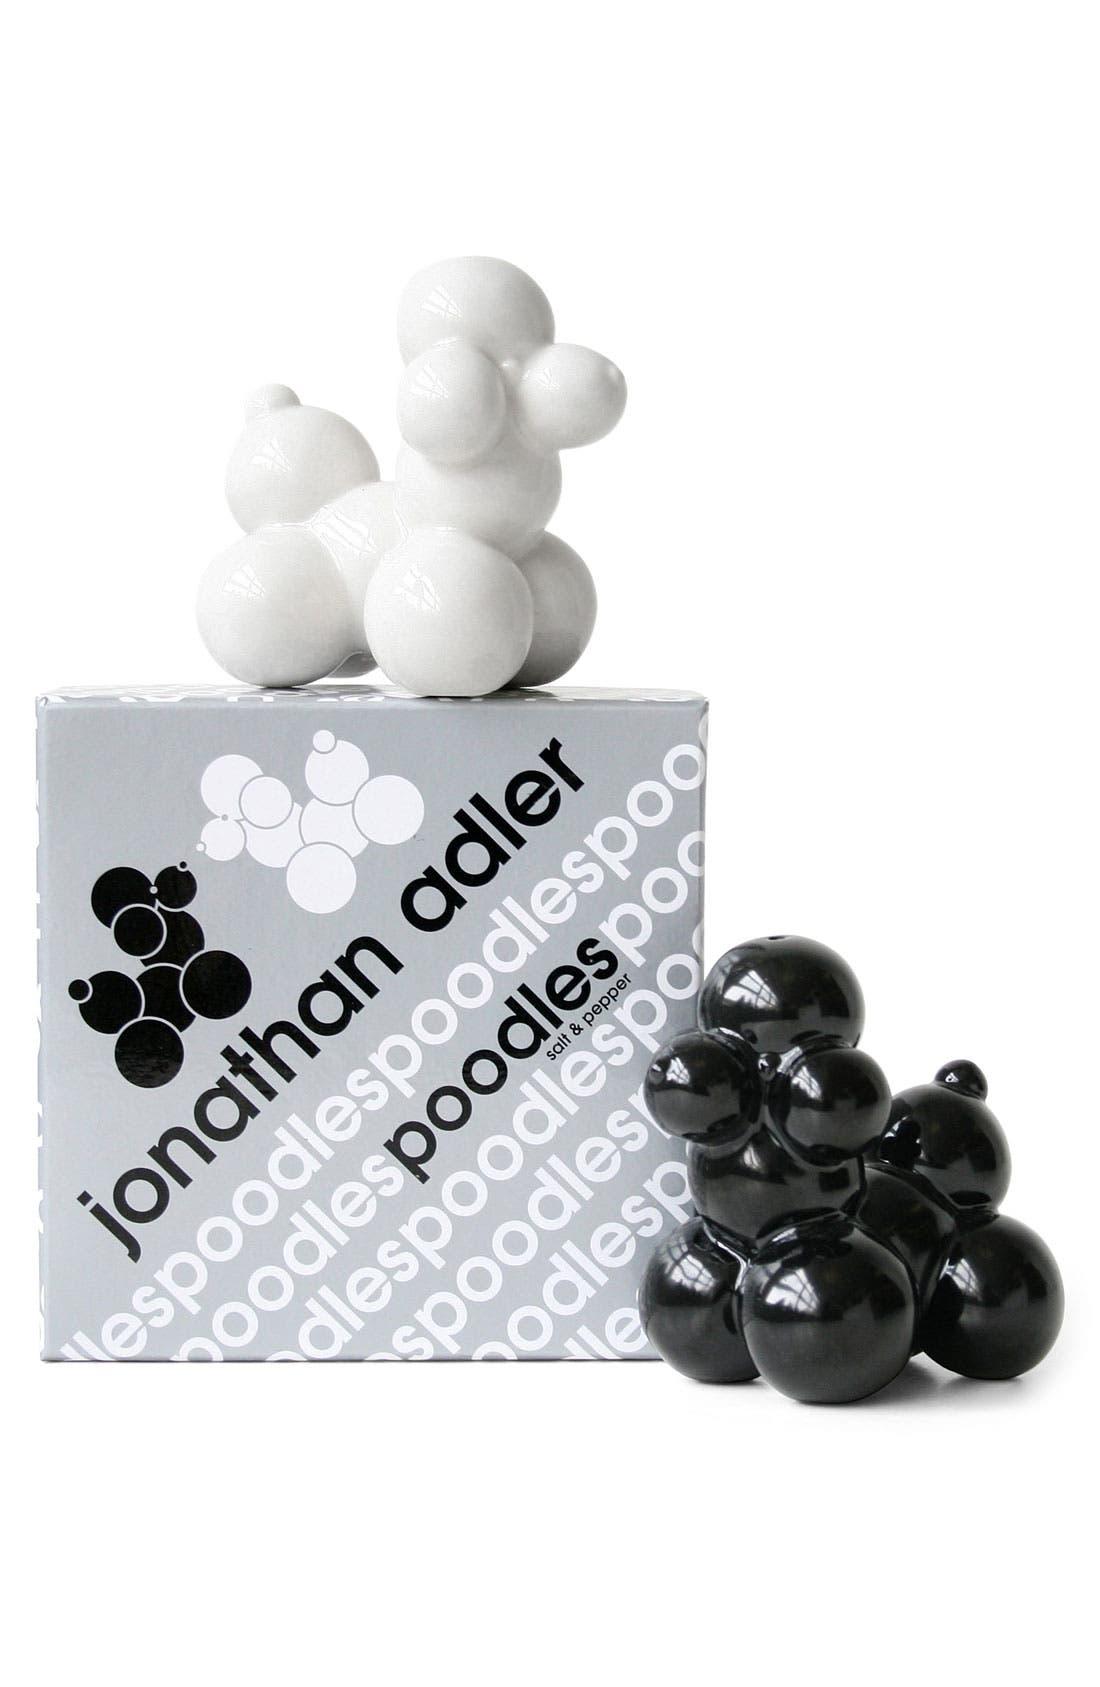 Alternate Image 1 Selected - Jonathan Adler Poodle Salt & Pepper Shakers